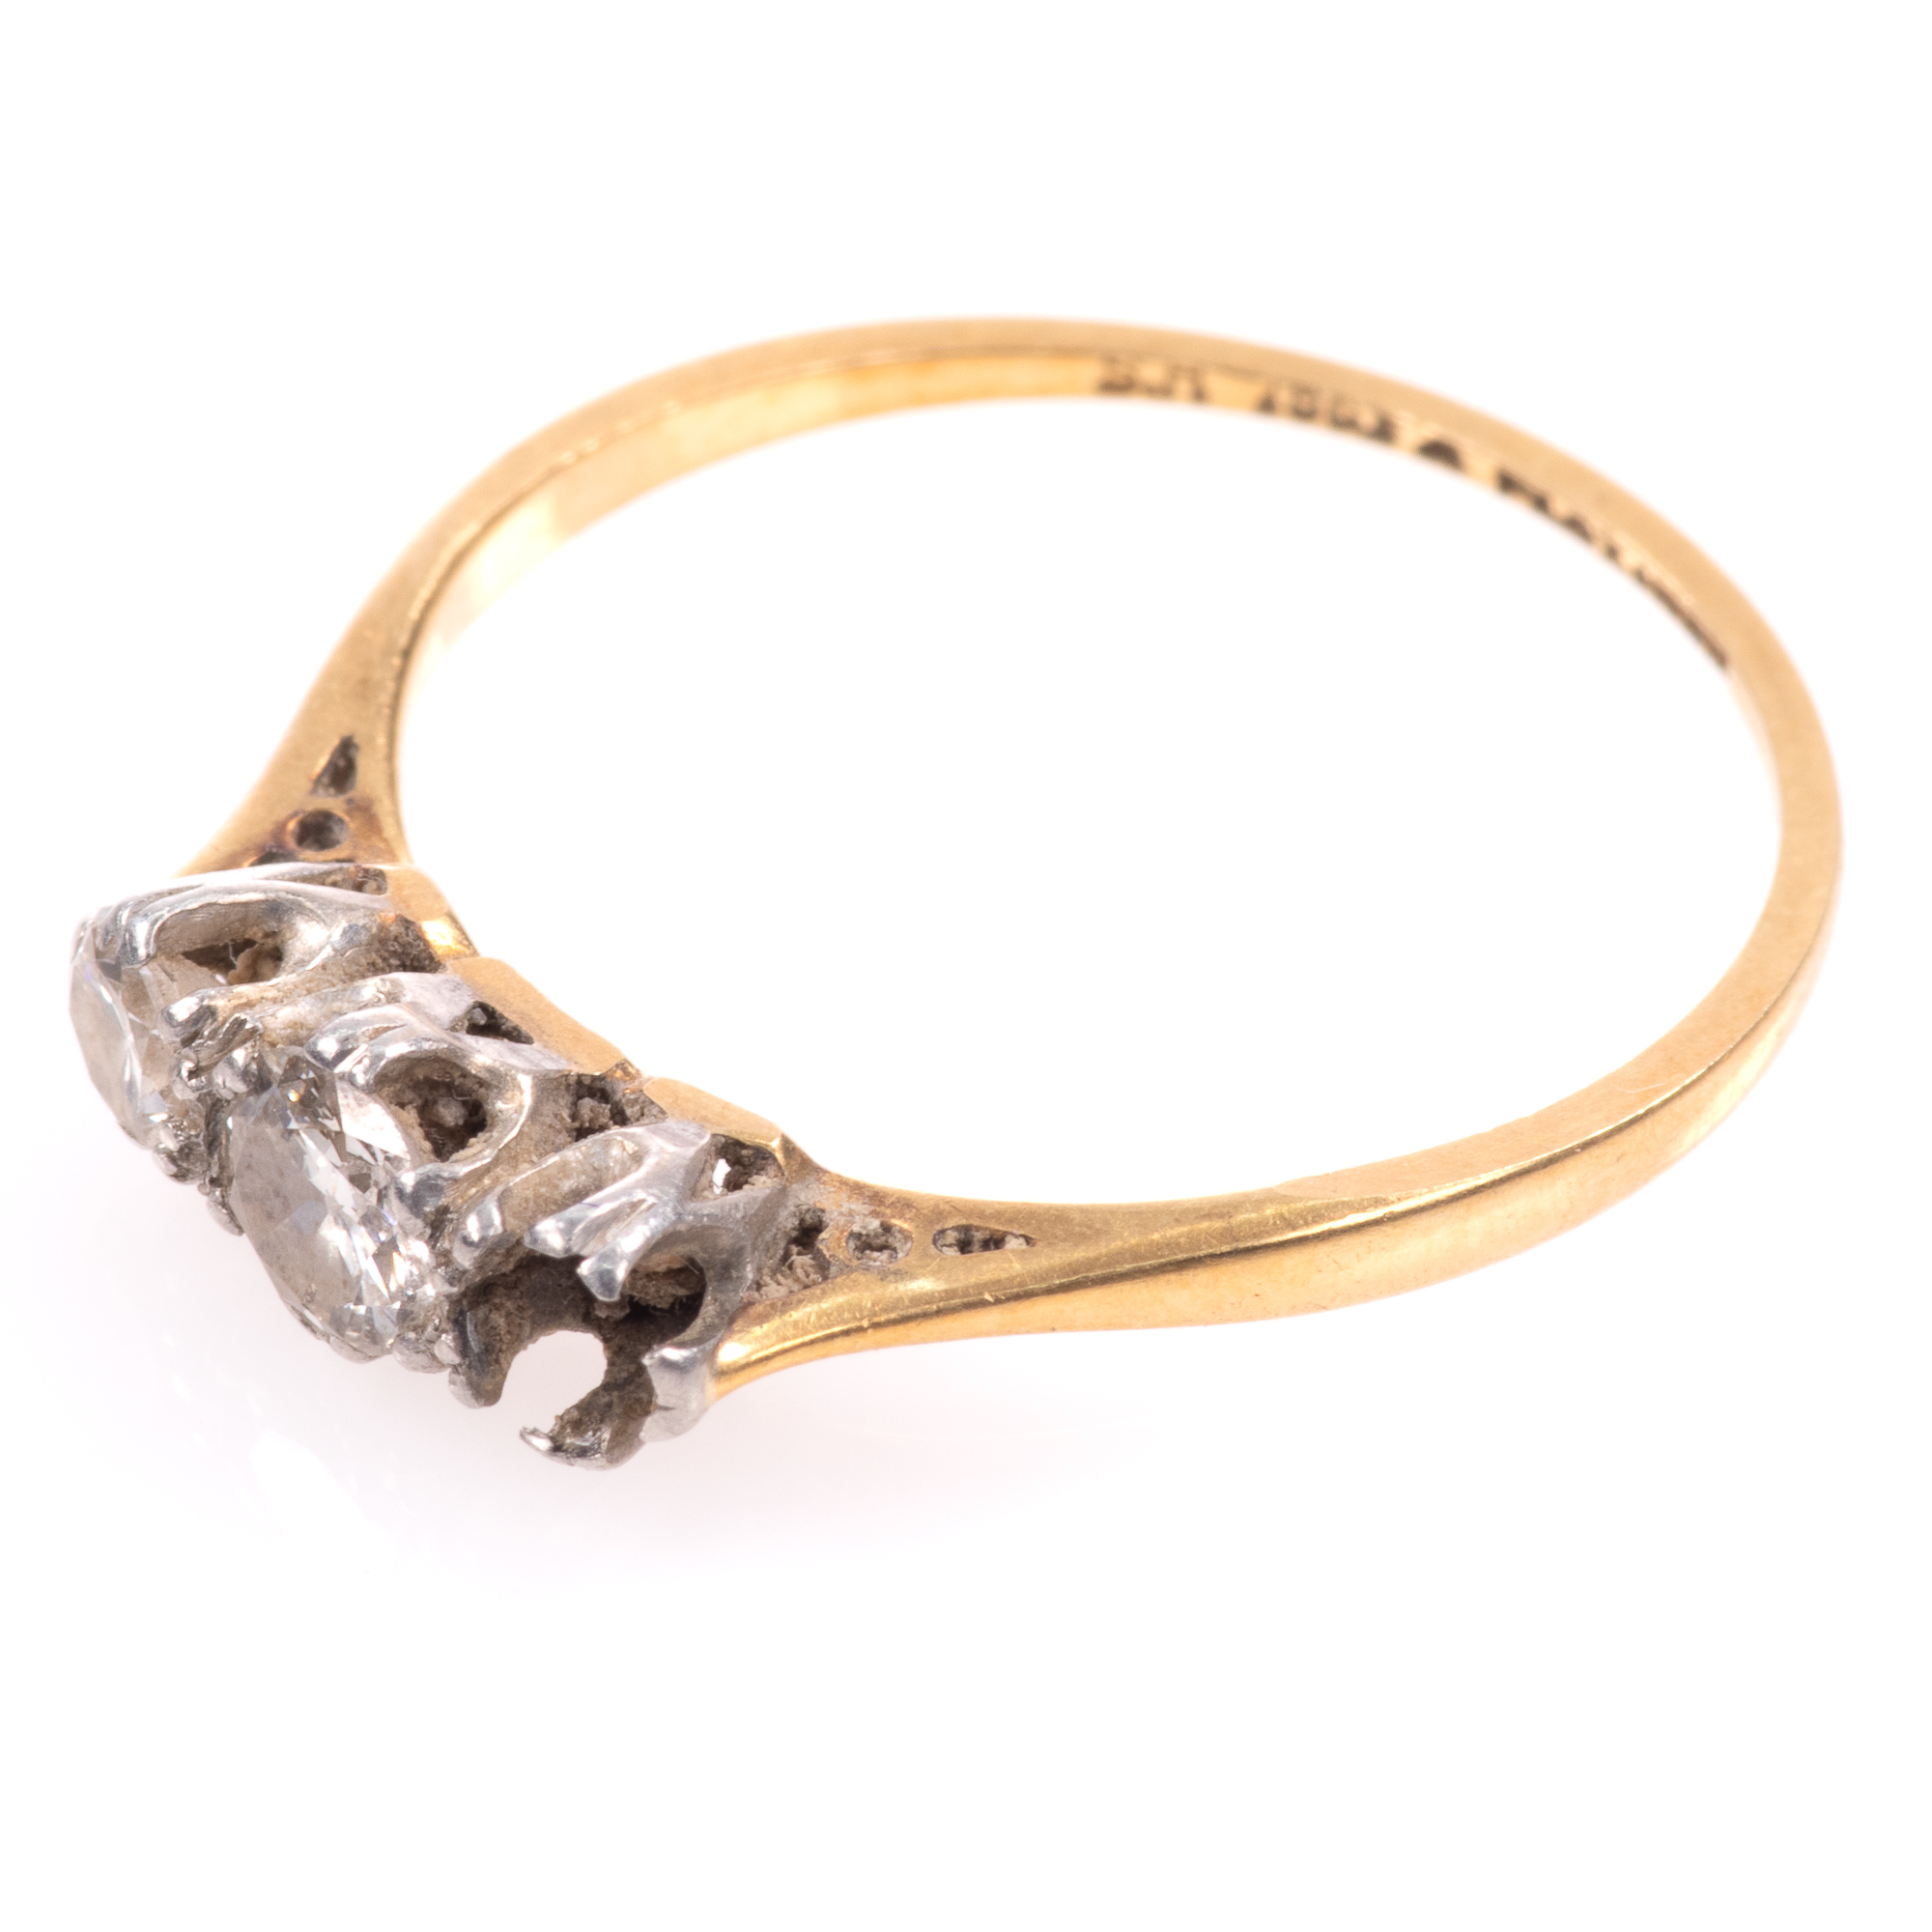 18ct Gold & Platinum 0.40ct Diamond Ring - Image 5 of 8